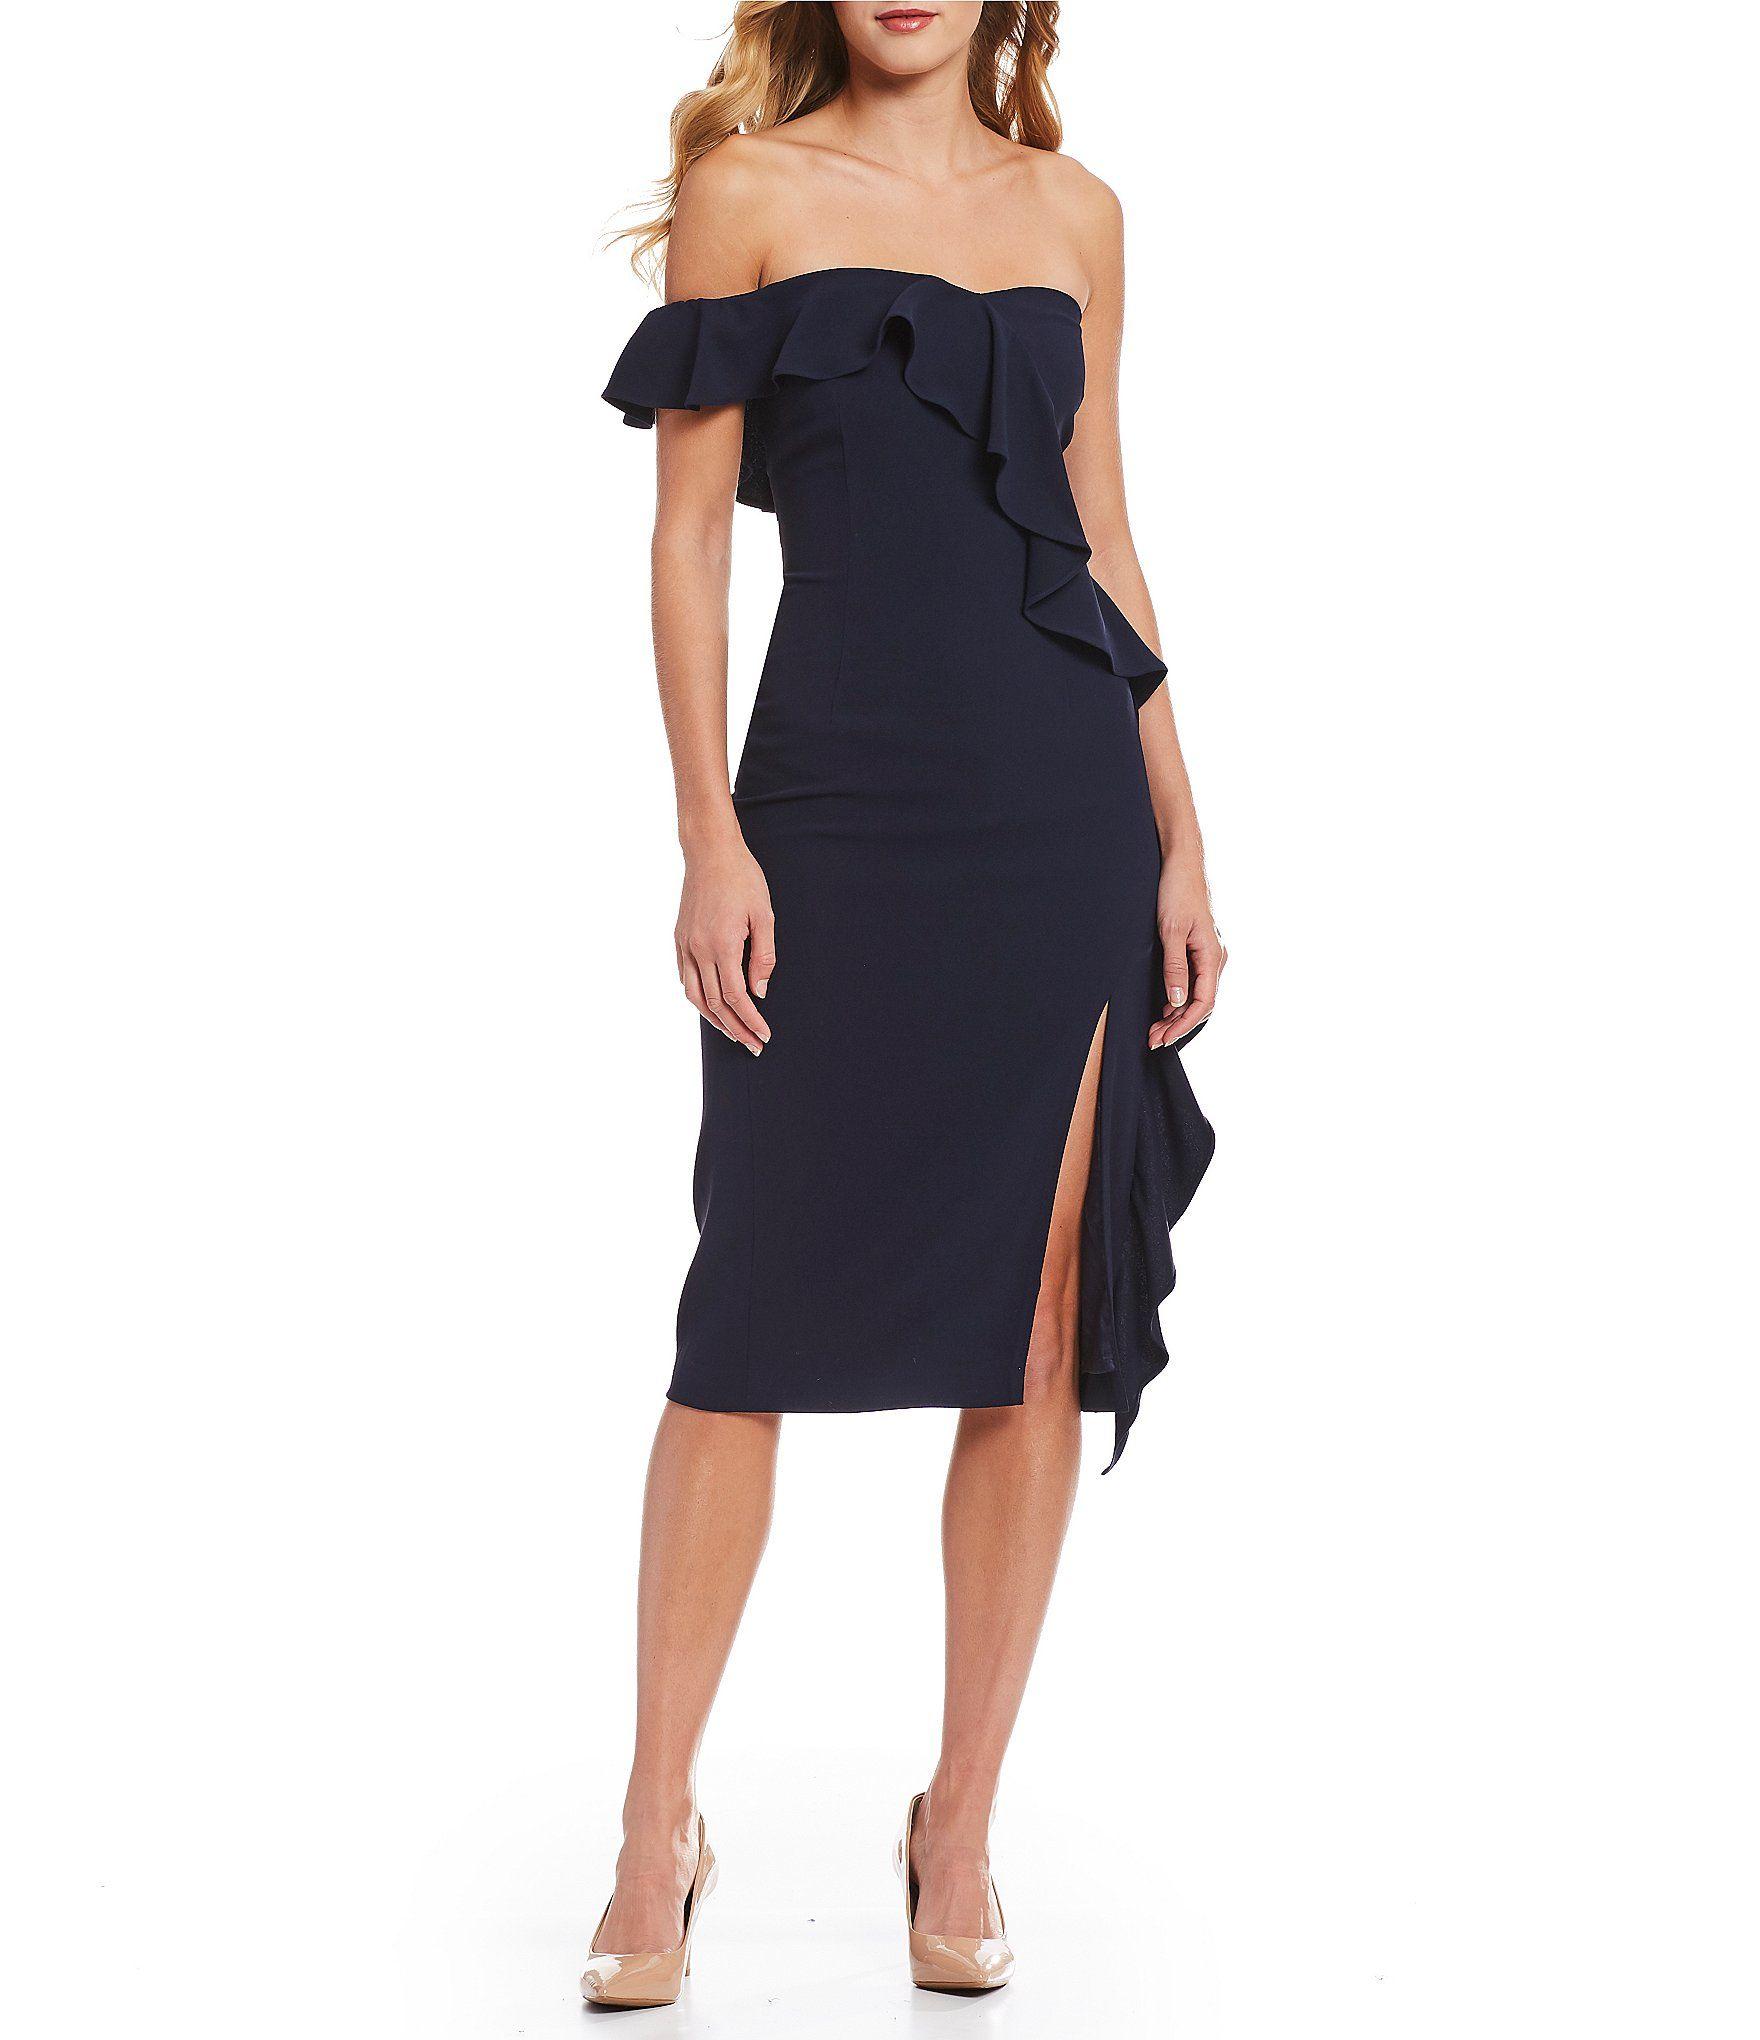 ccd0e5eb91d Gianni Bini Tye One Shoulder Cascading Ruffle Slit Front Midi Dress ...